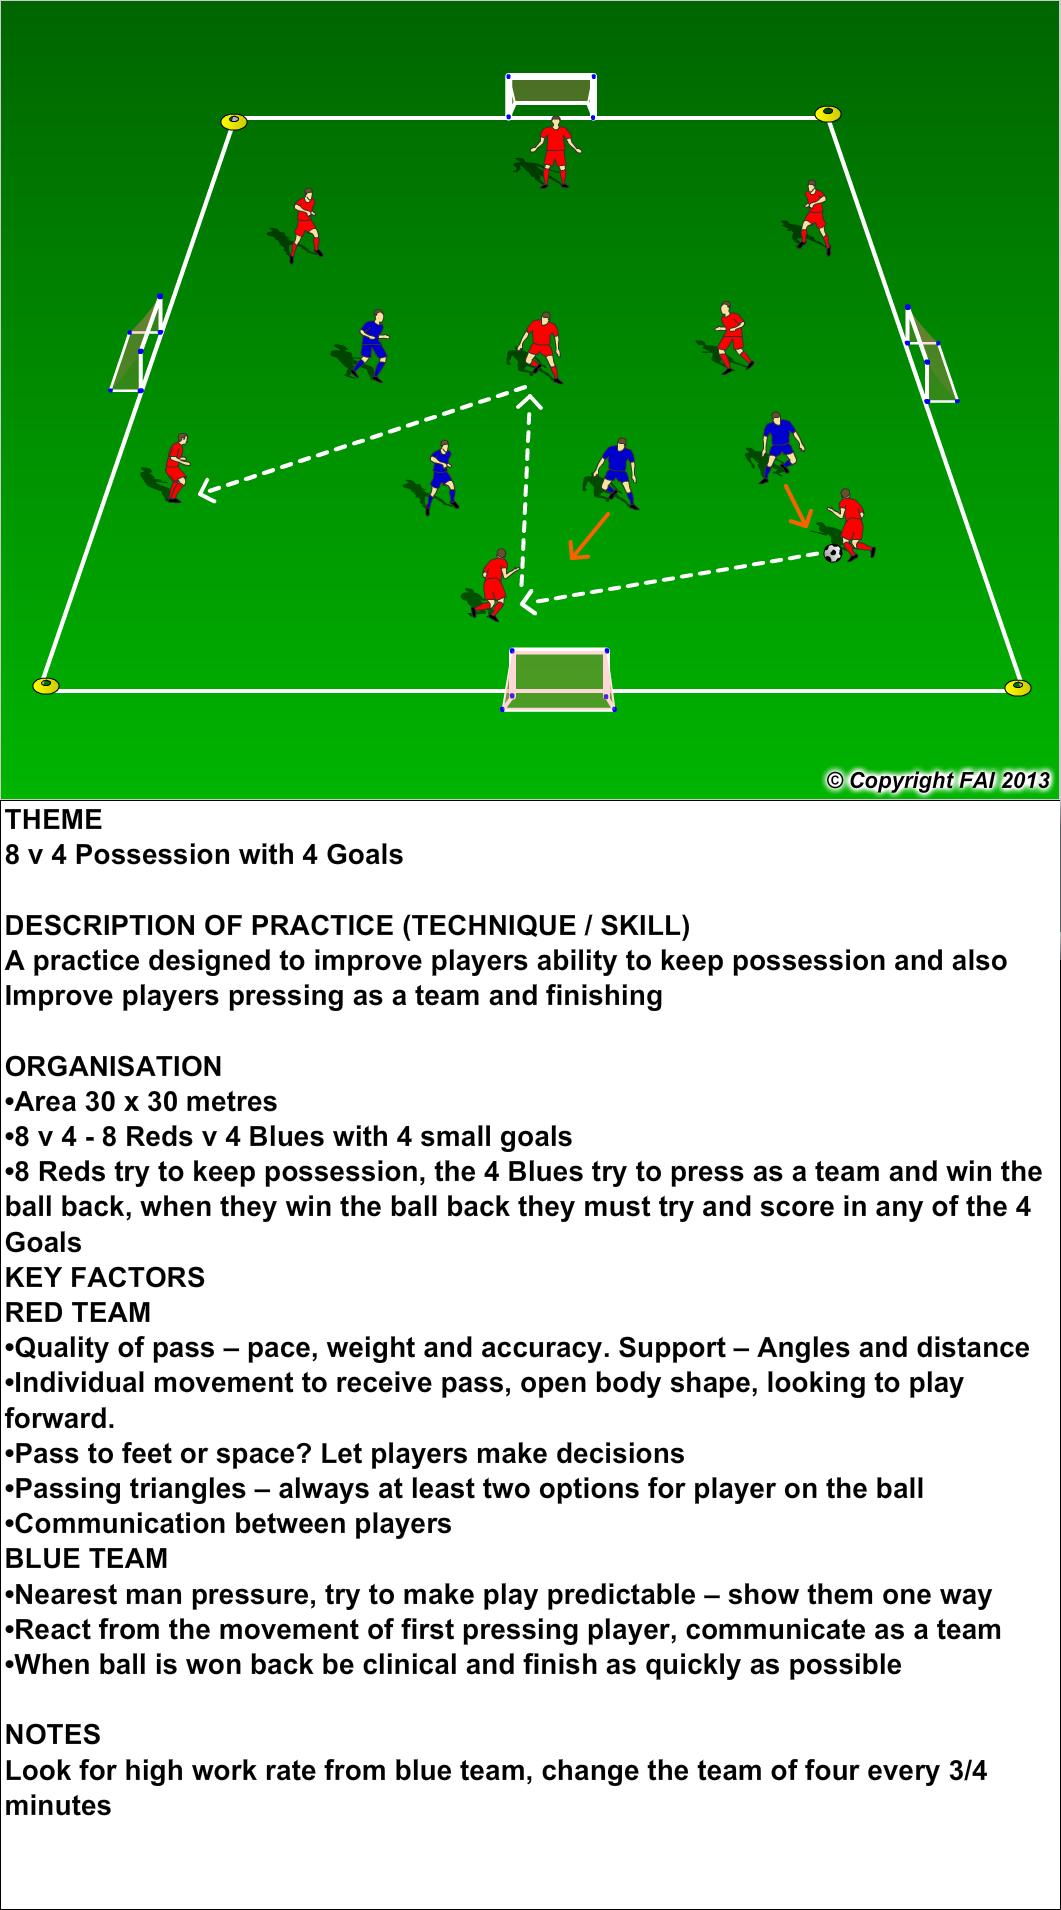 RT @Jamesscott89Com: @CoachingFamily THEME 8 v 4 Possession with 4 Goals http://t.co/VcXrsMEJlu